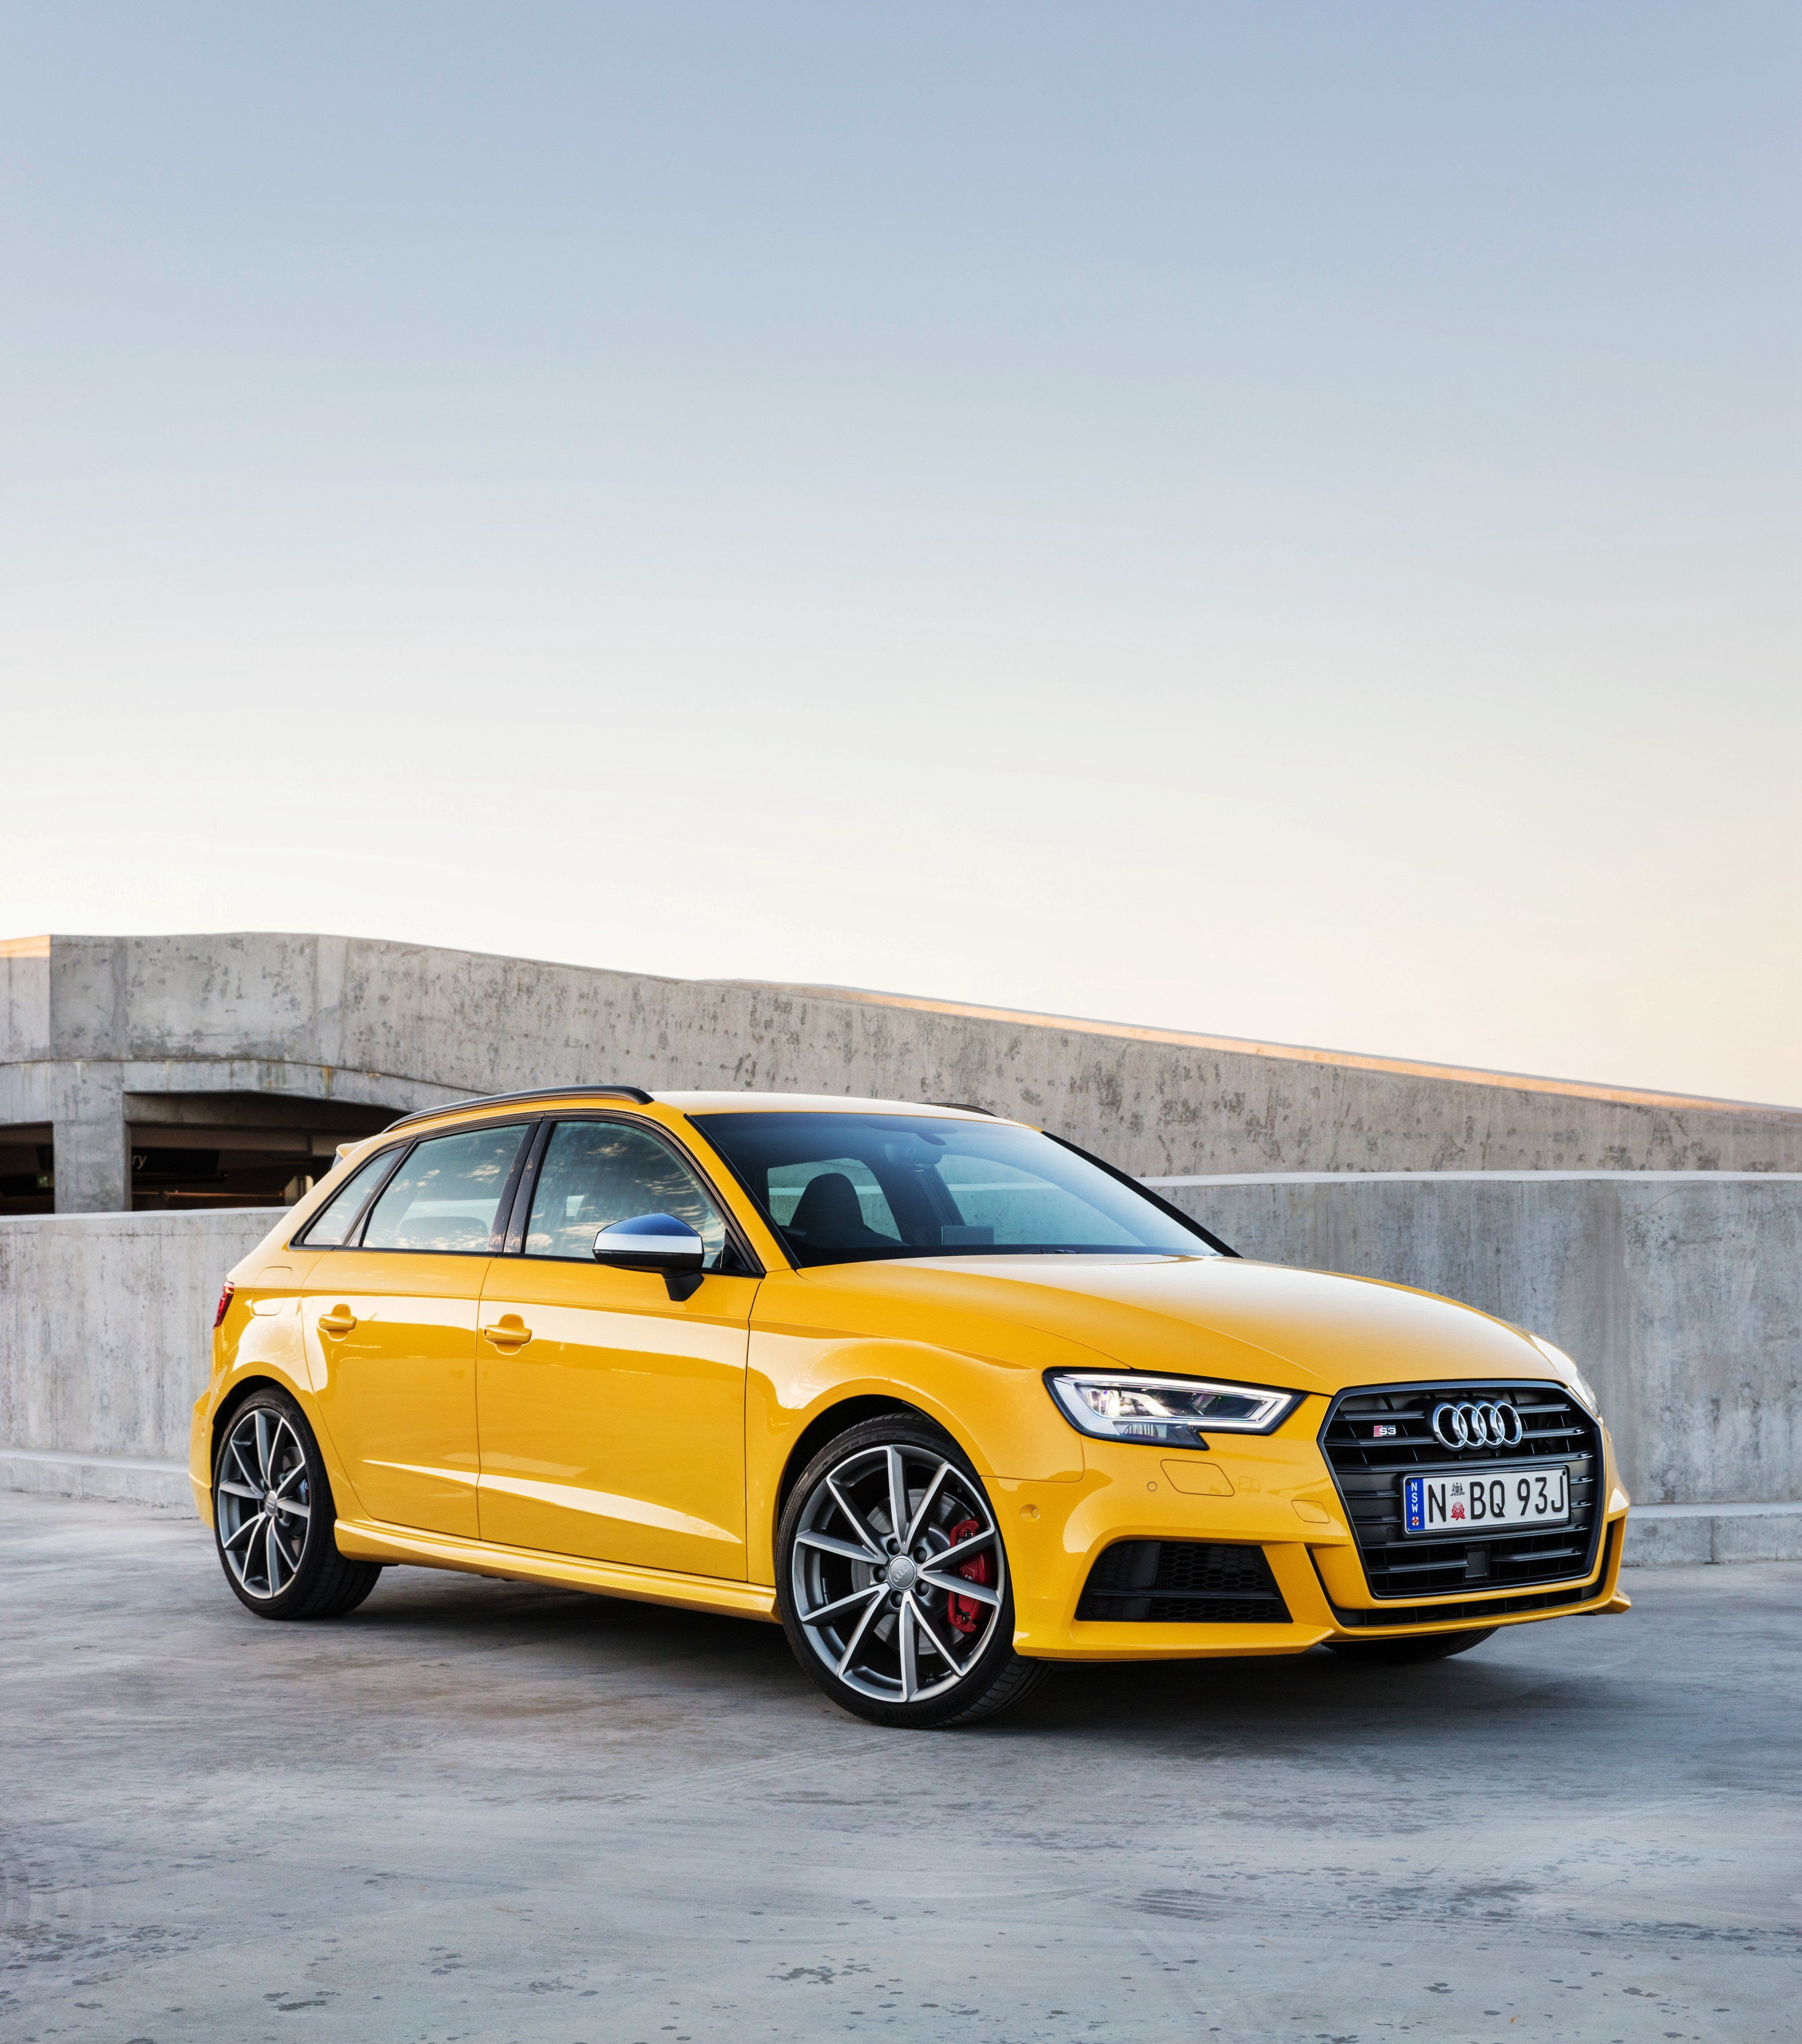 Audi S3 Sportback 2016 Audi Audi Rs3 Audi A3 Sportback